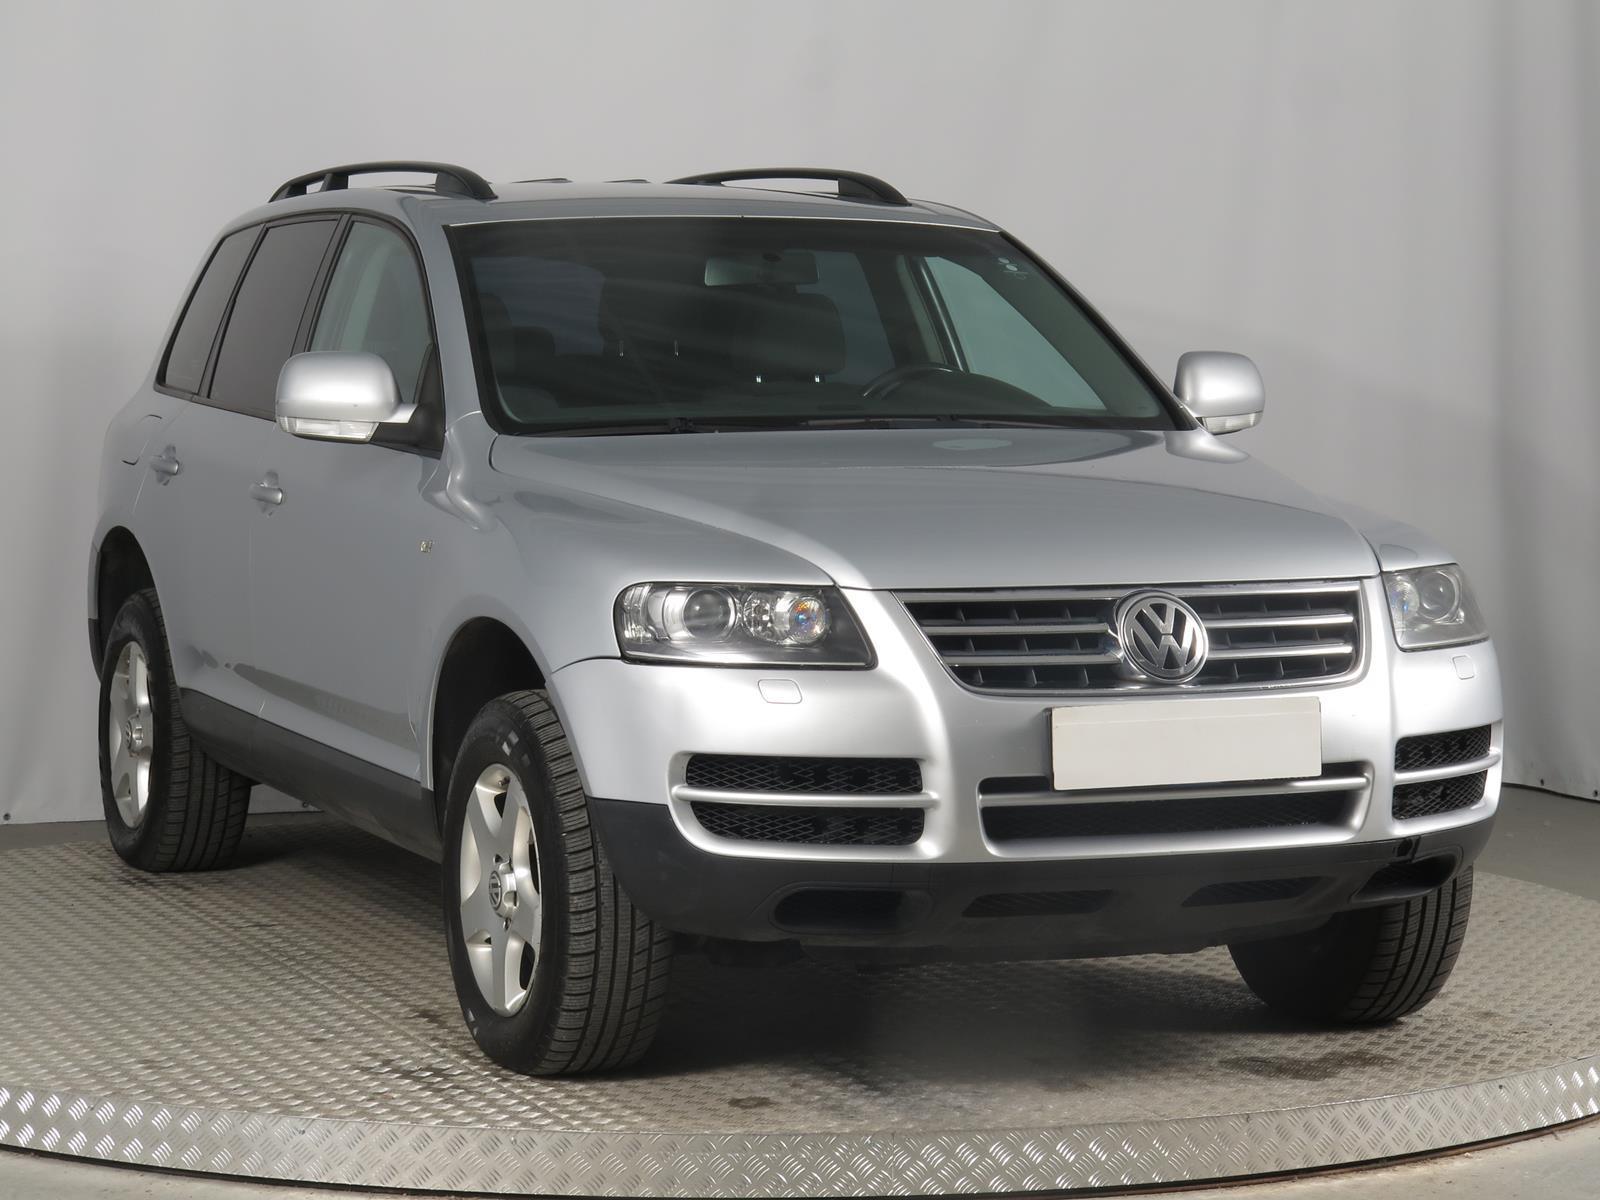 Volkswagen Touareg 2.5 R5 TDI 128kW SUV nafta